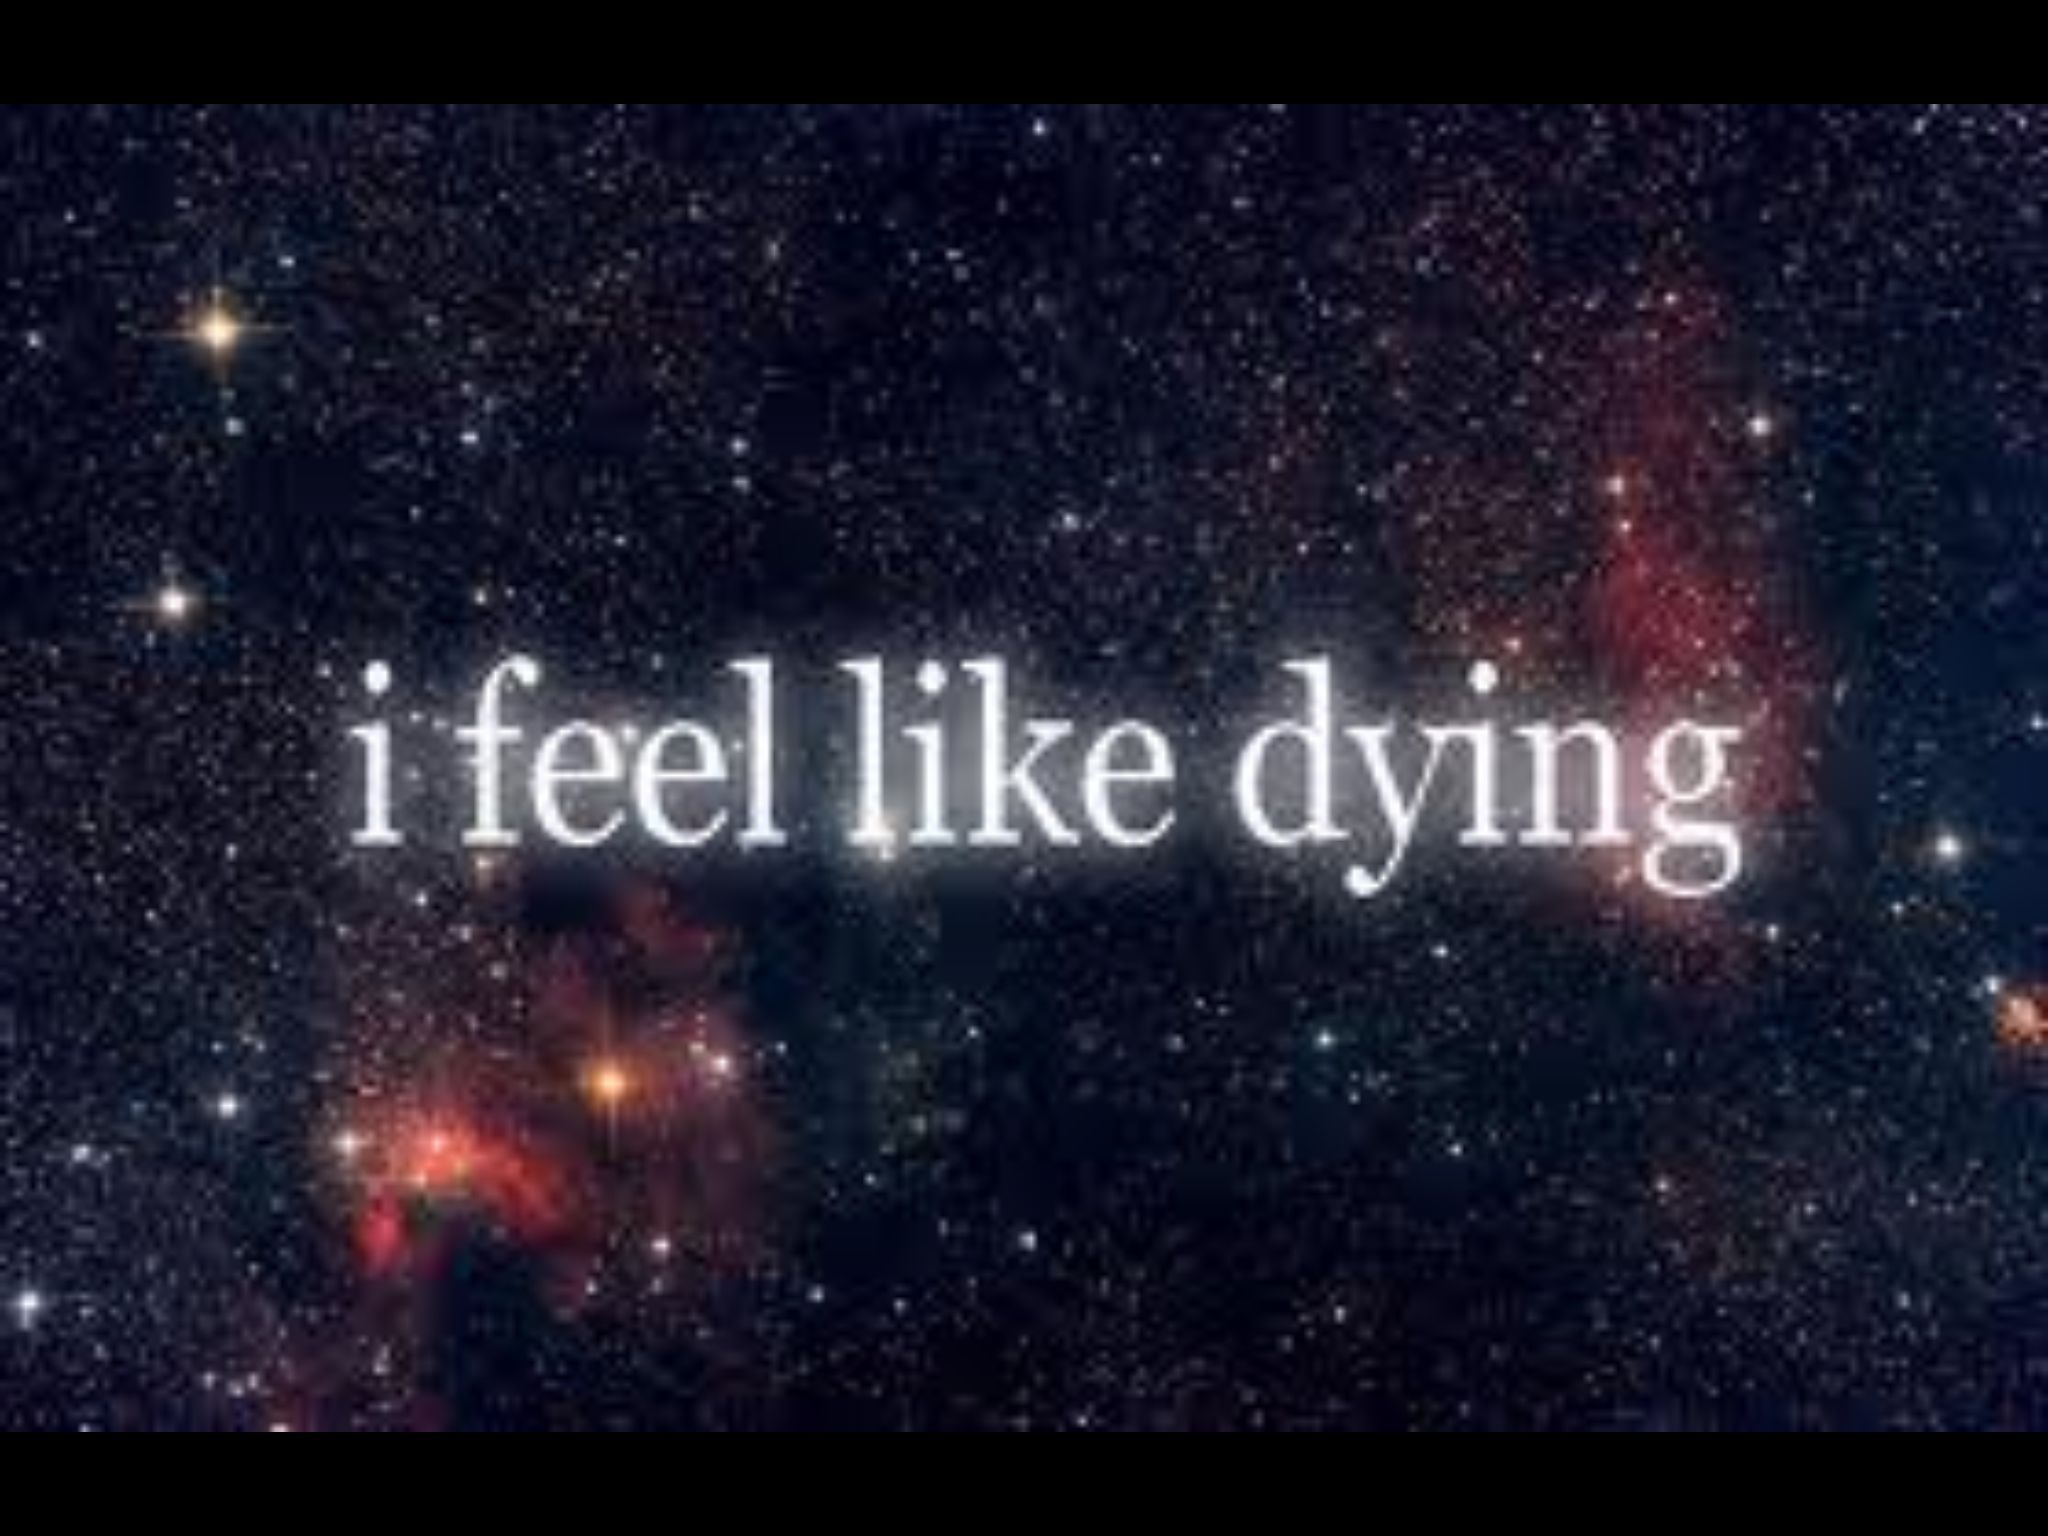 I need help. I feel like dying.?